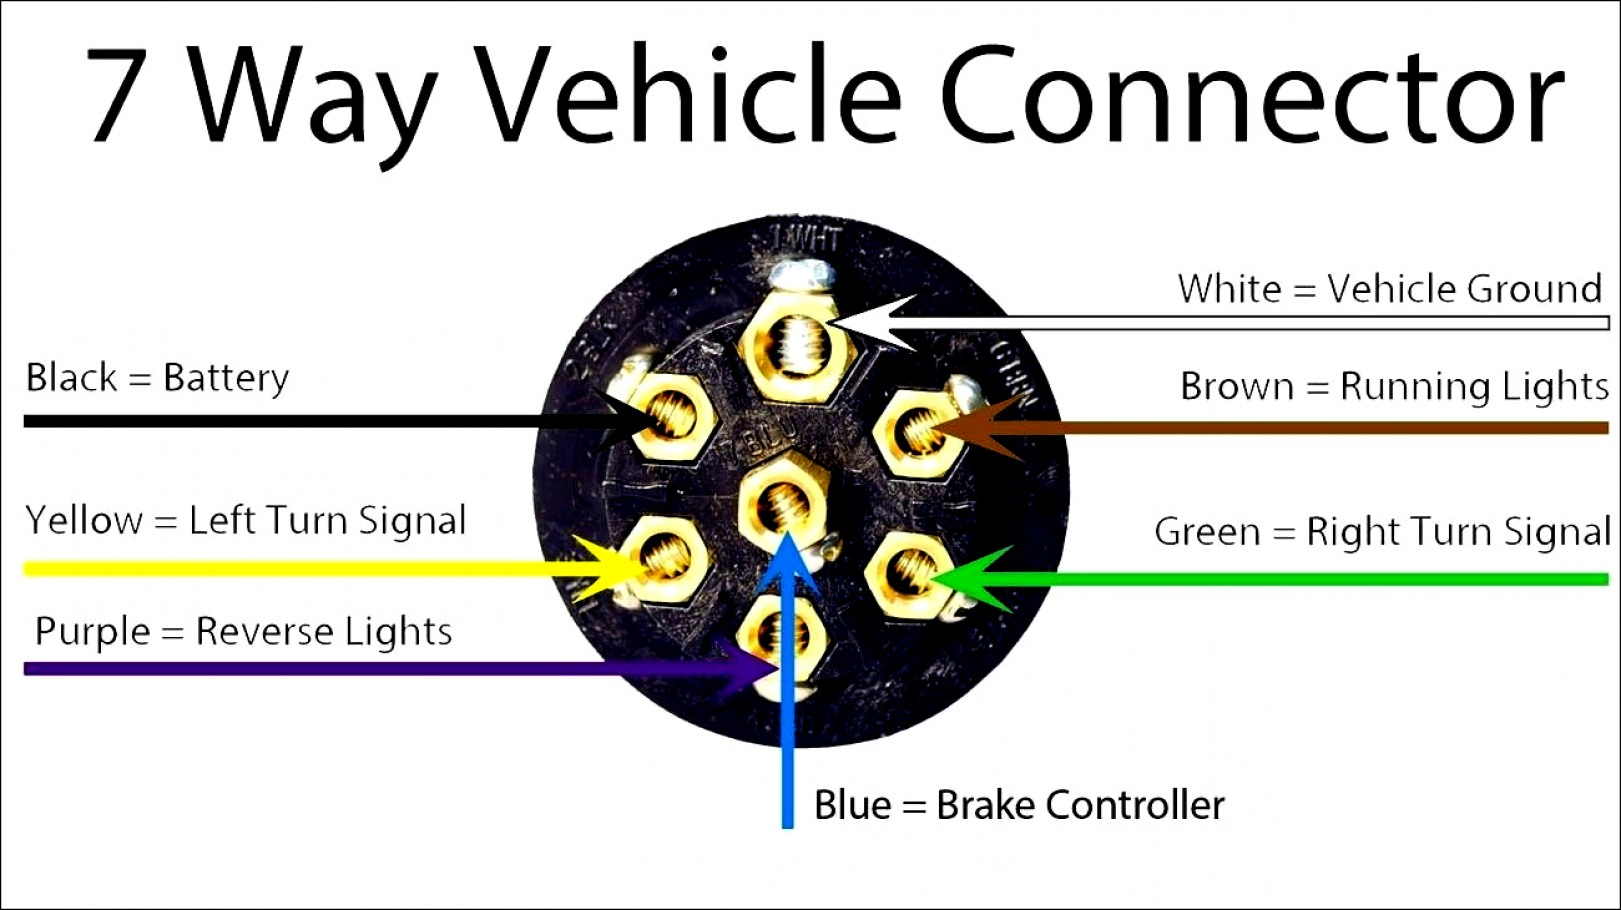 6 Round Trailer Plug Wiring Diagram - Today Wiring Diagram - 7 Way Trailer Plug Wiring Diagram